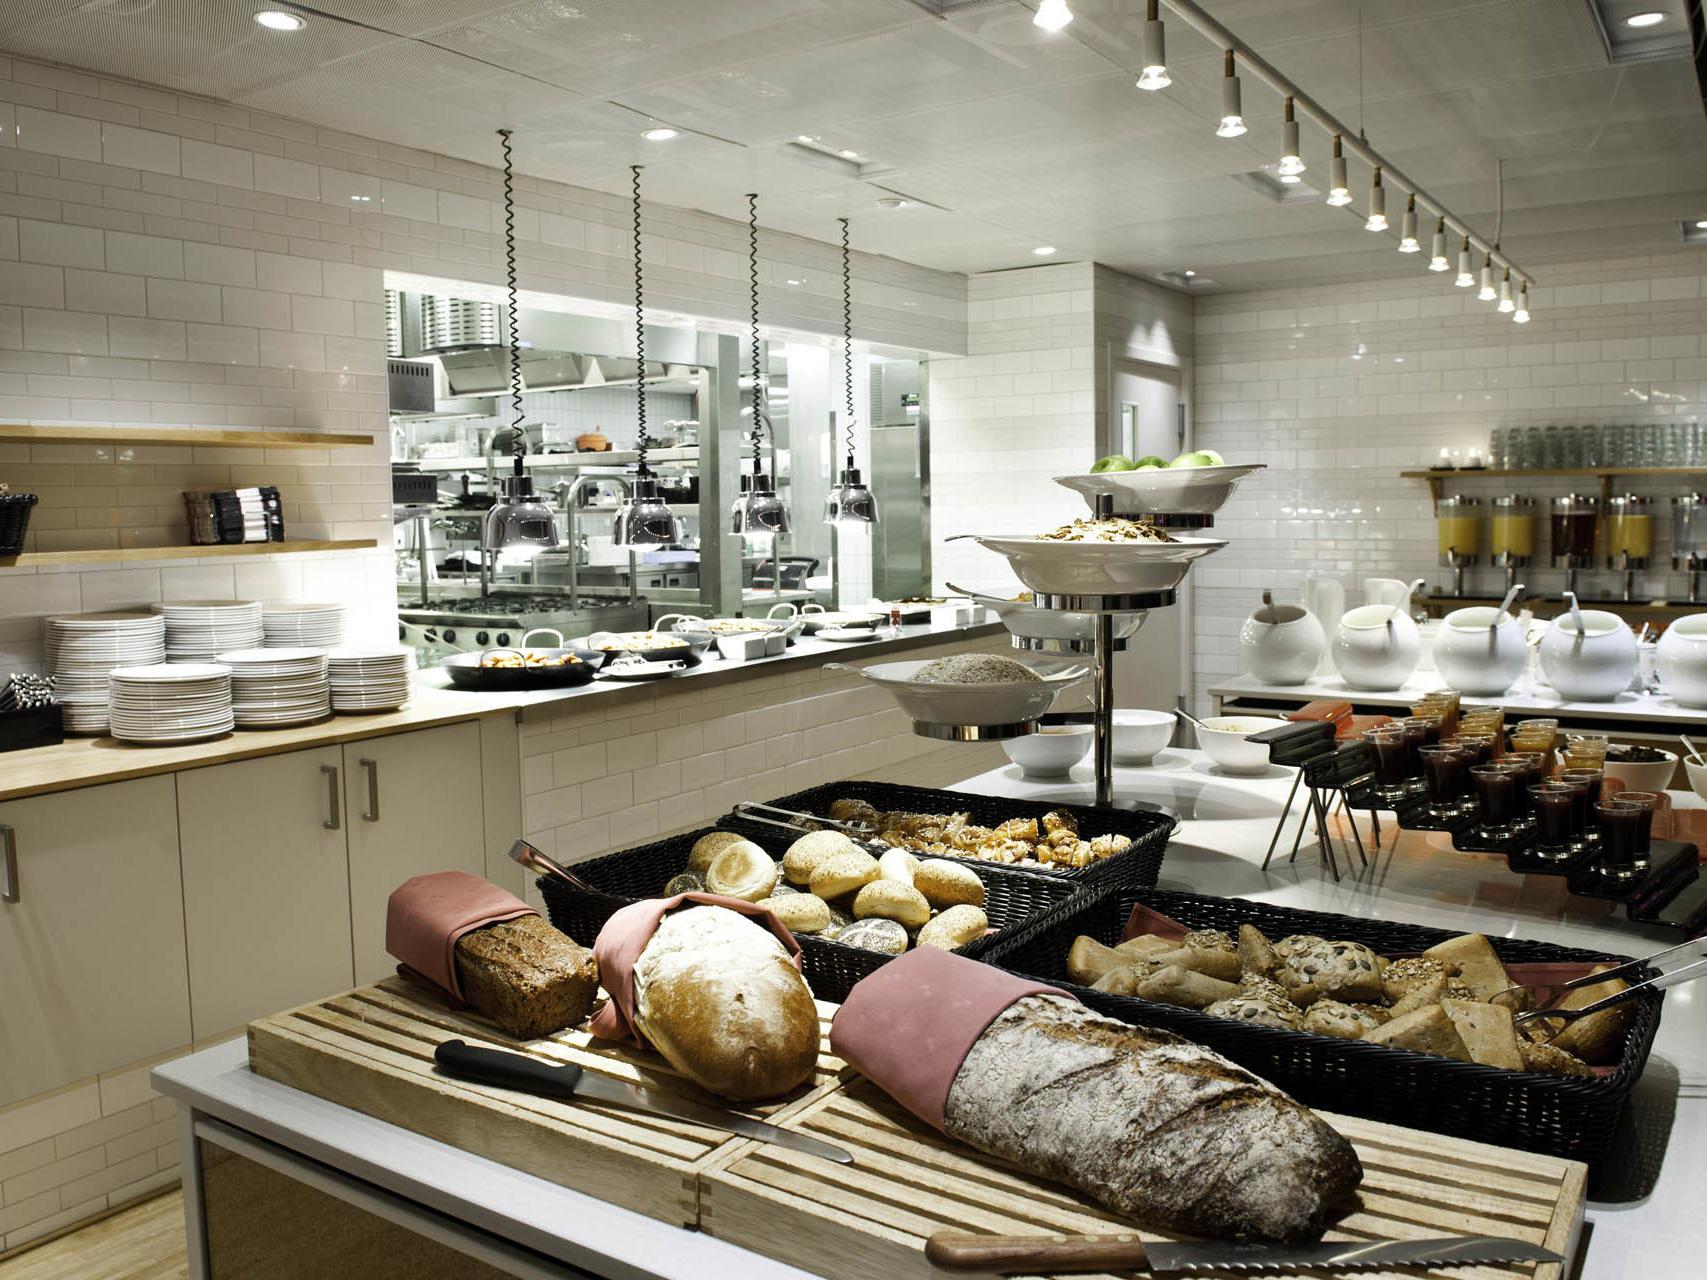 Daily Buffet Breakfast at Hotel Birger Jarl in Stockholm, Sweden